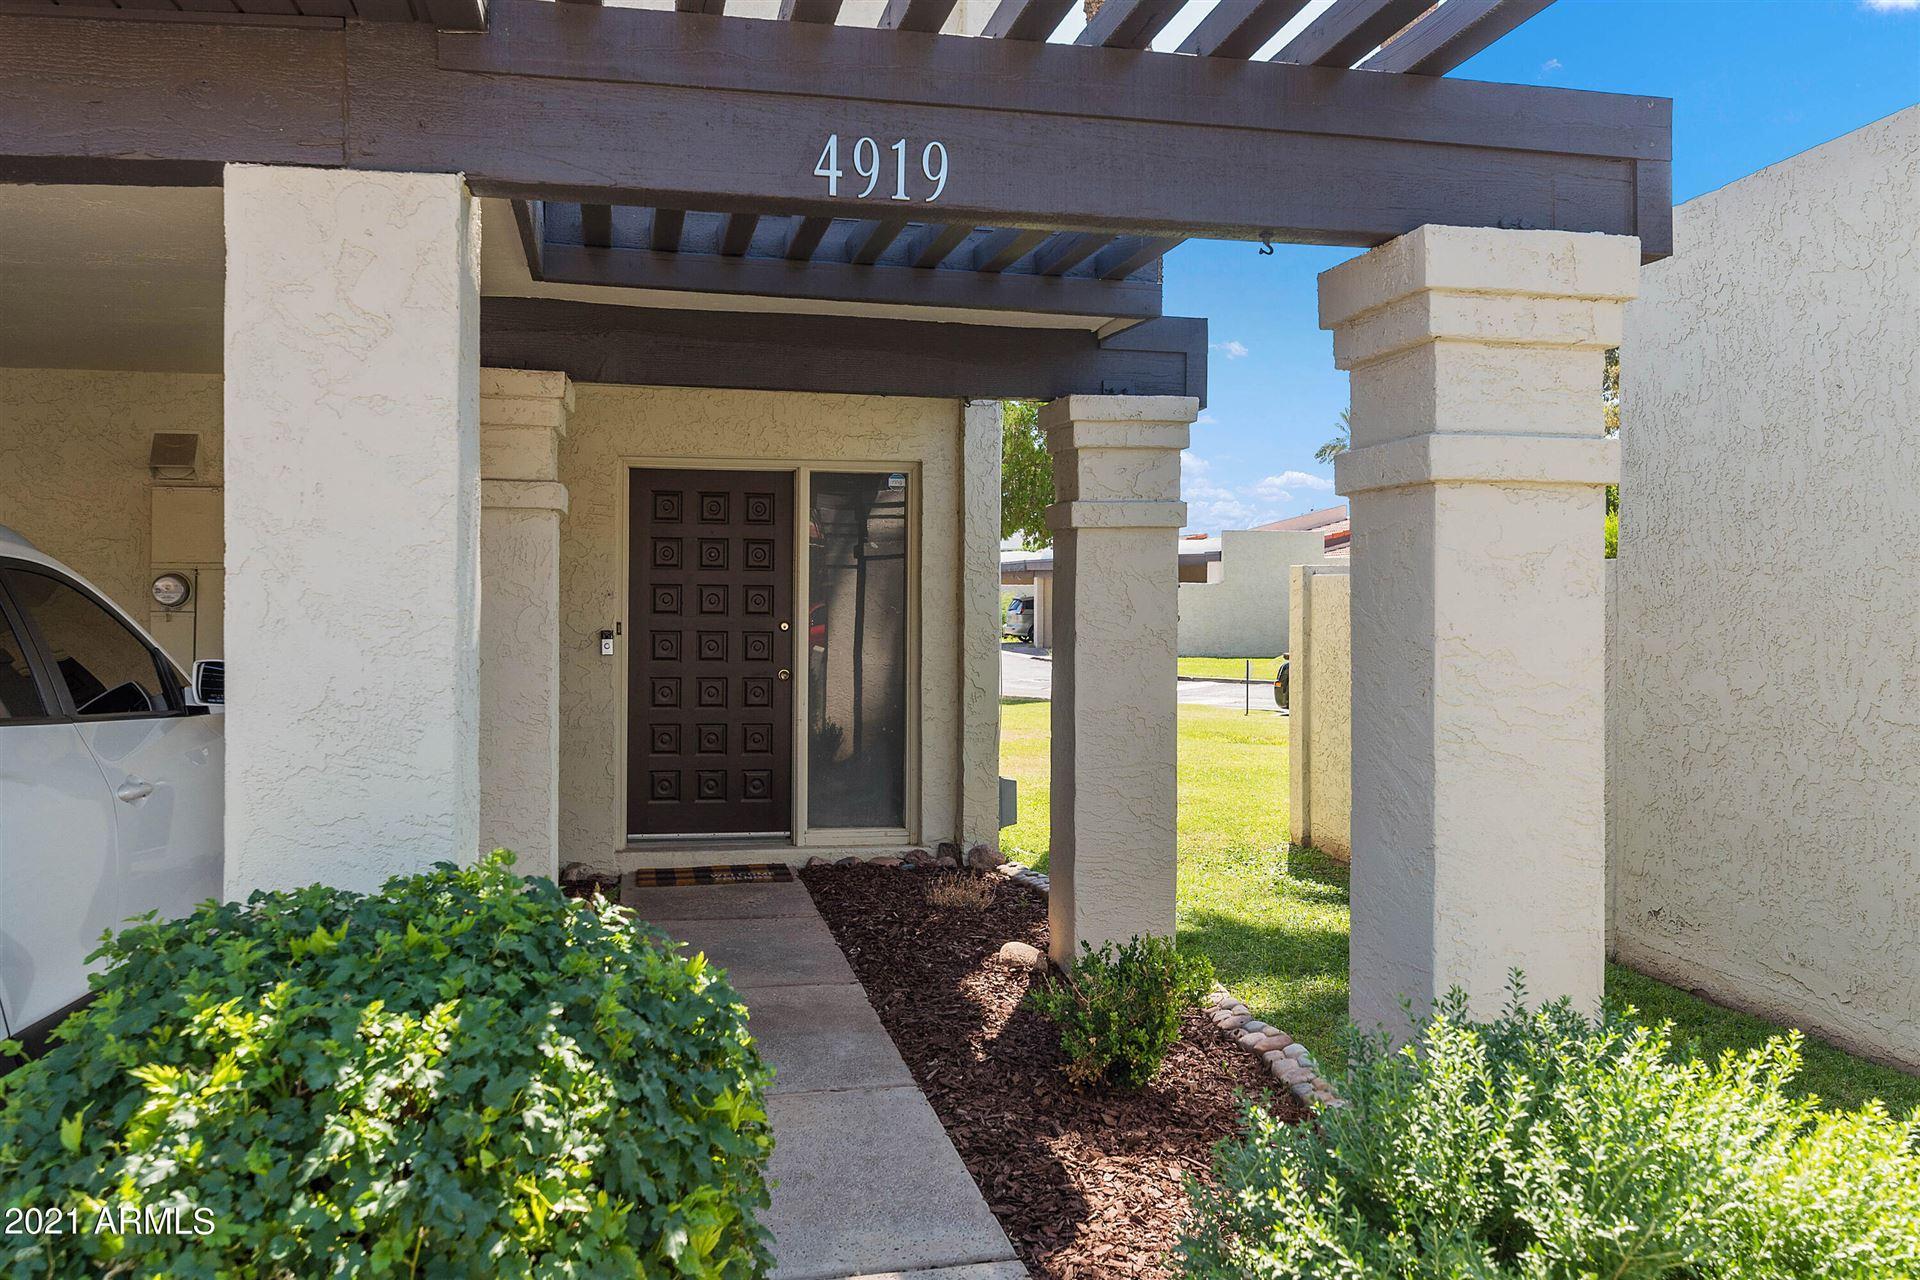 4919 E EDGEMONT Avenue, Phoenix, AZ 85008 - MLS#: 6298725